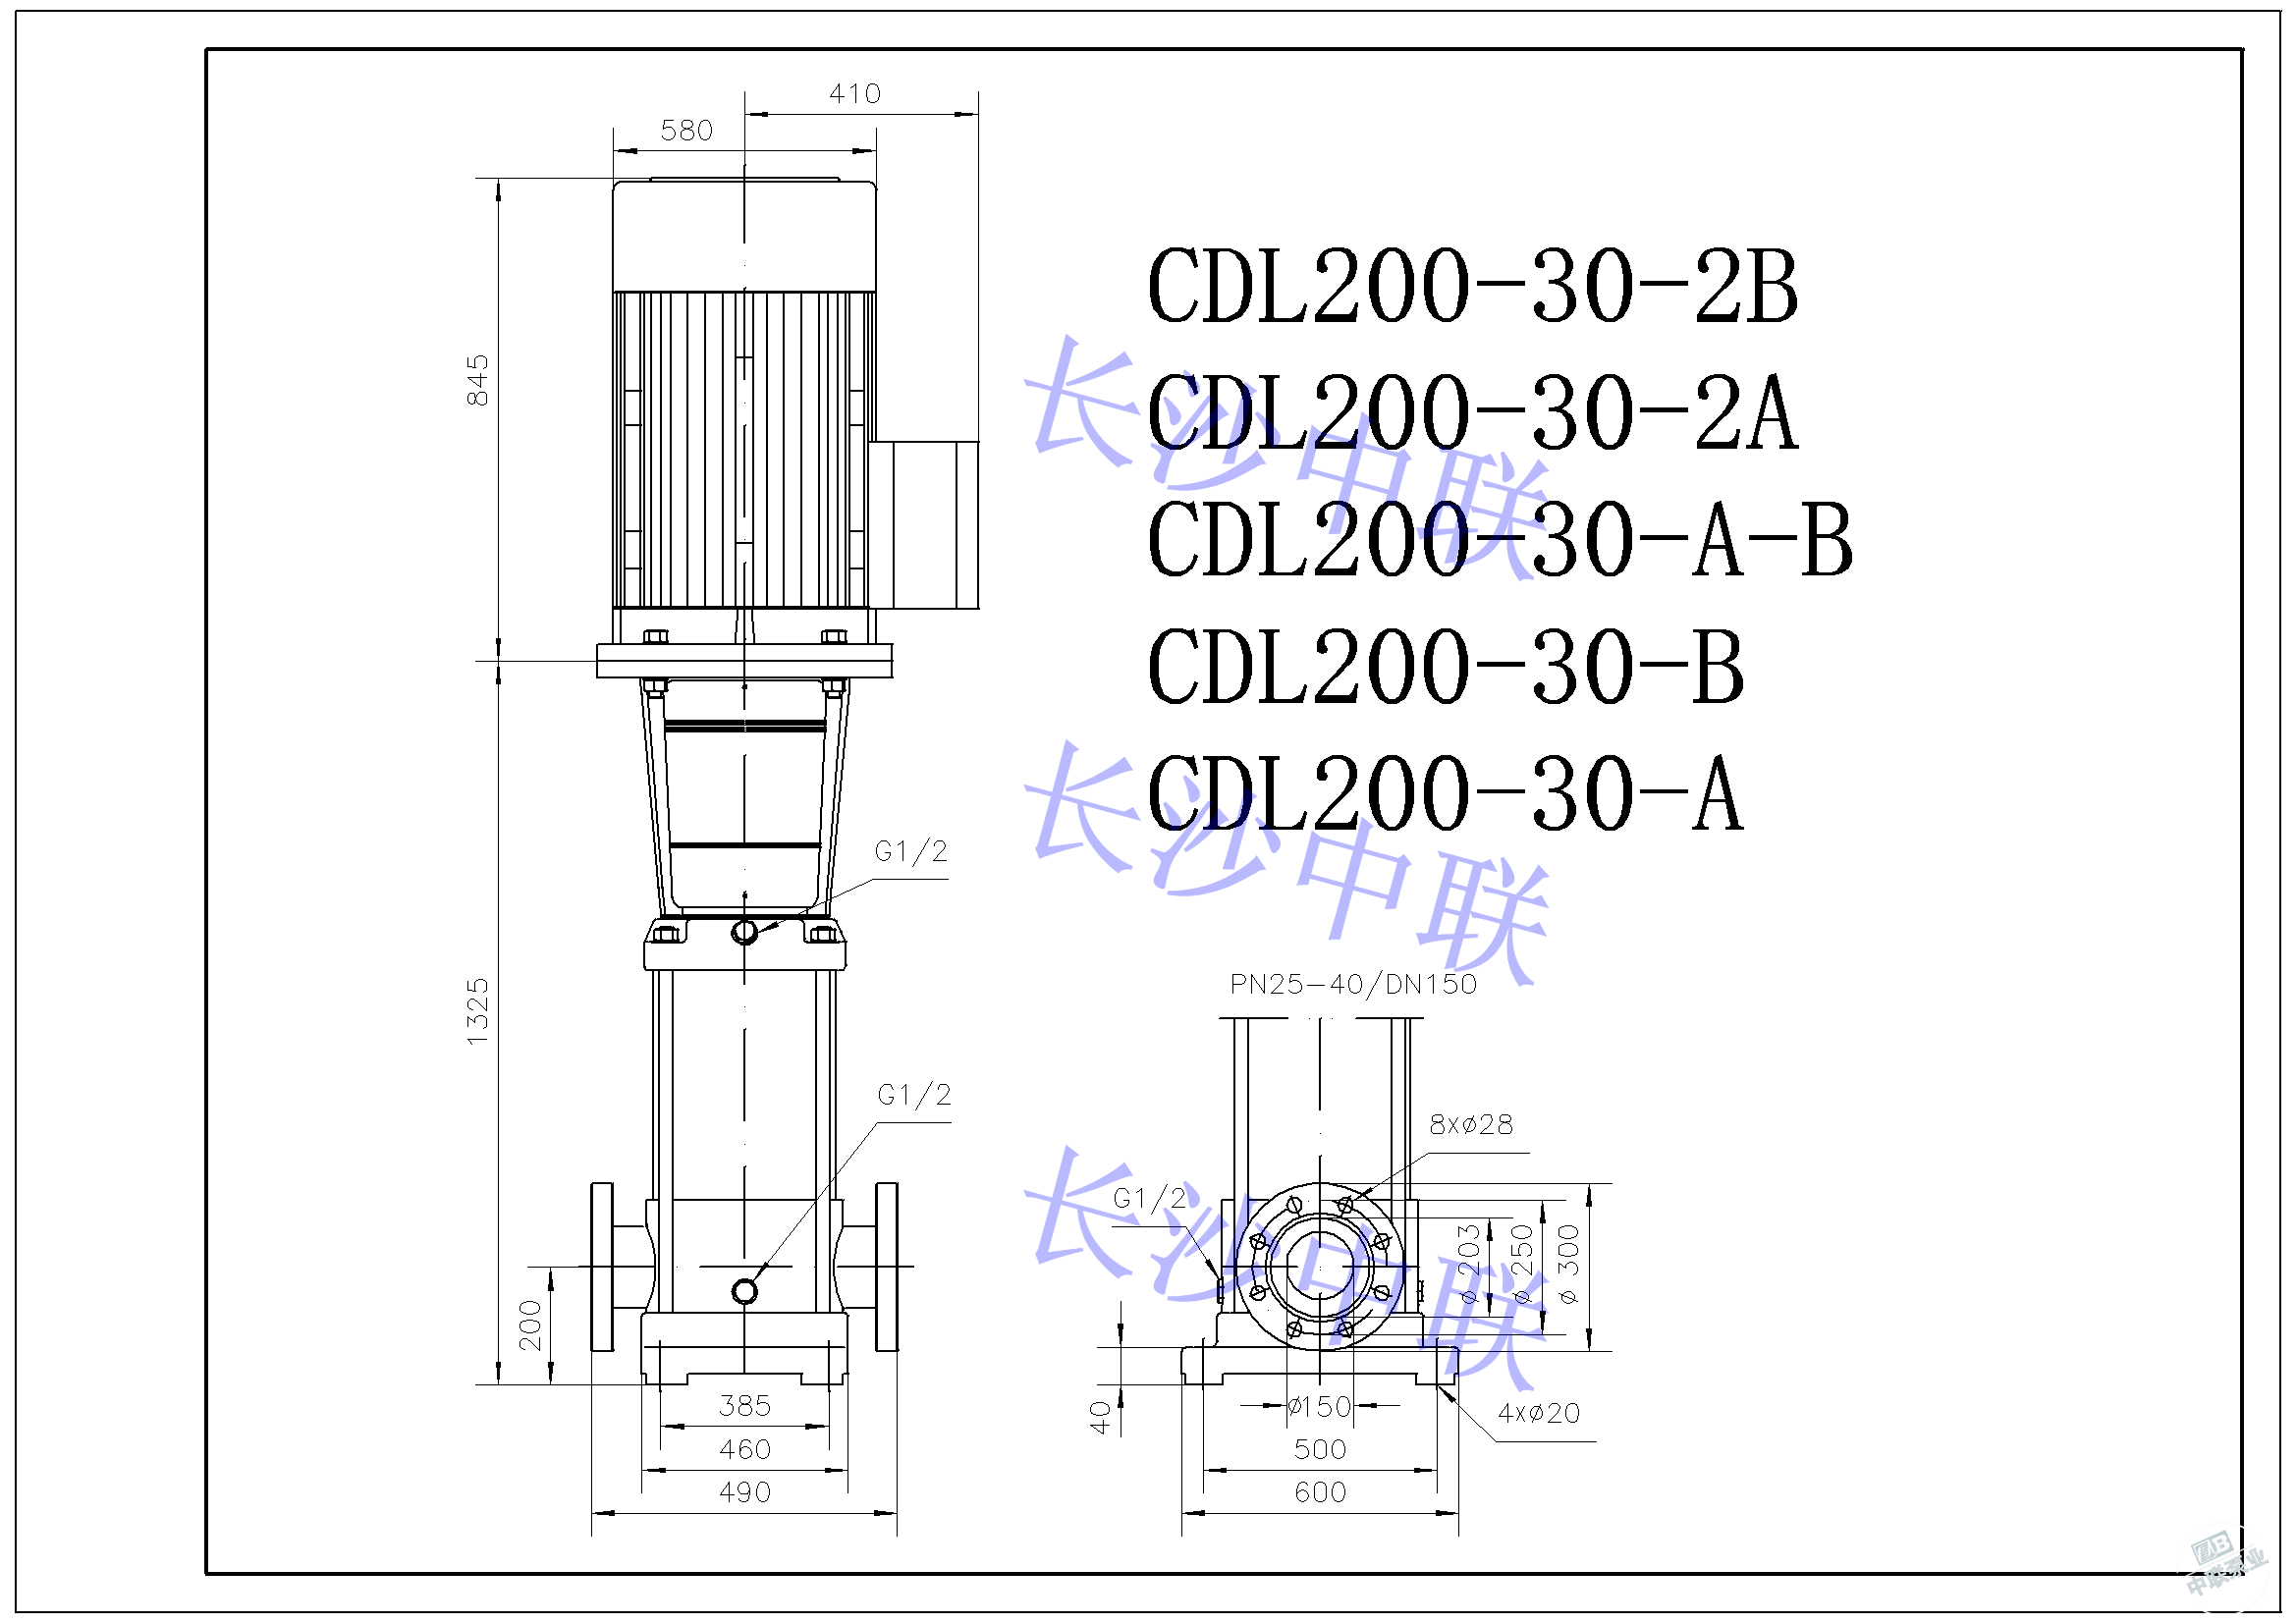 CDL200-30-2B multi-stage pump installation drawing